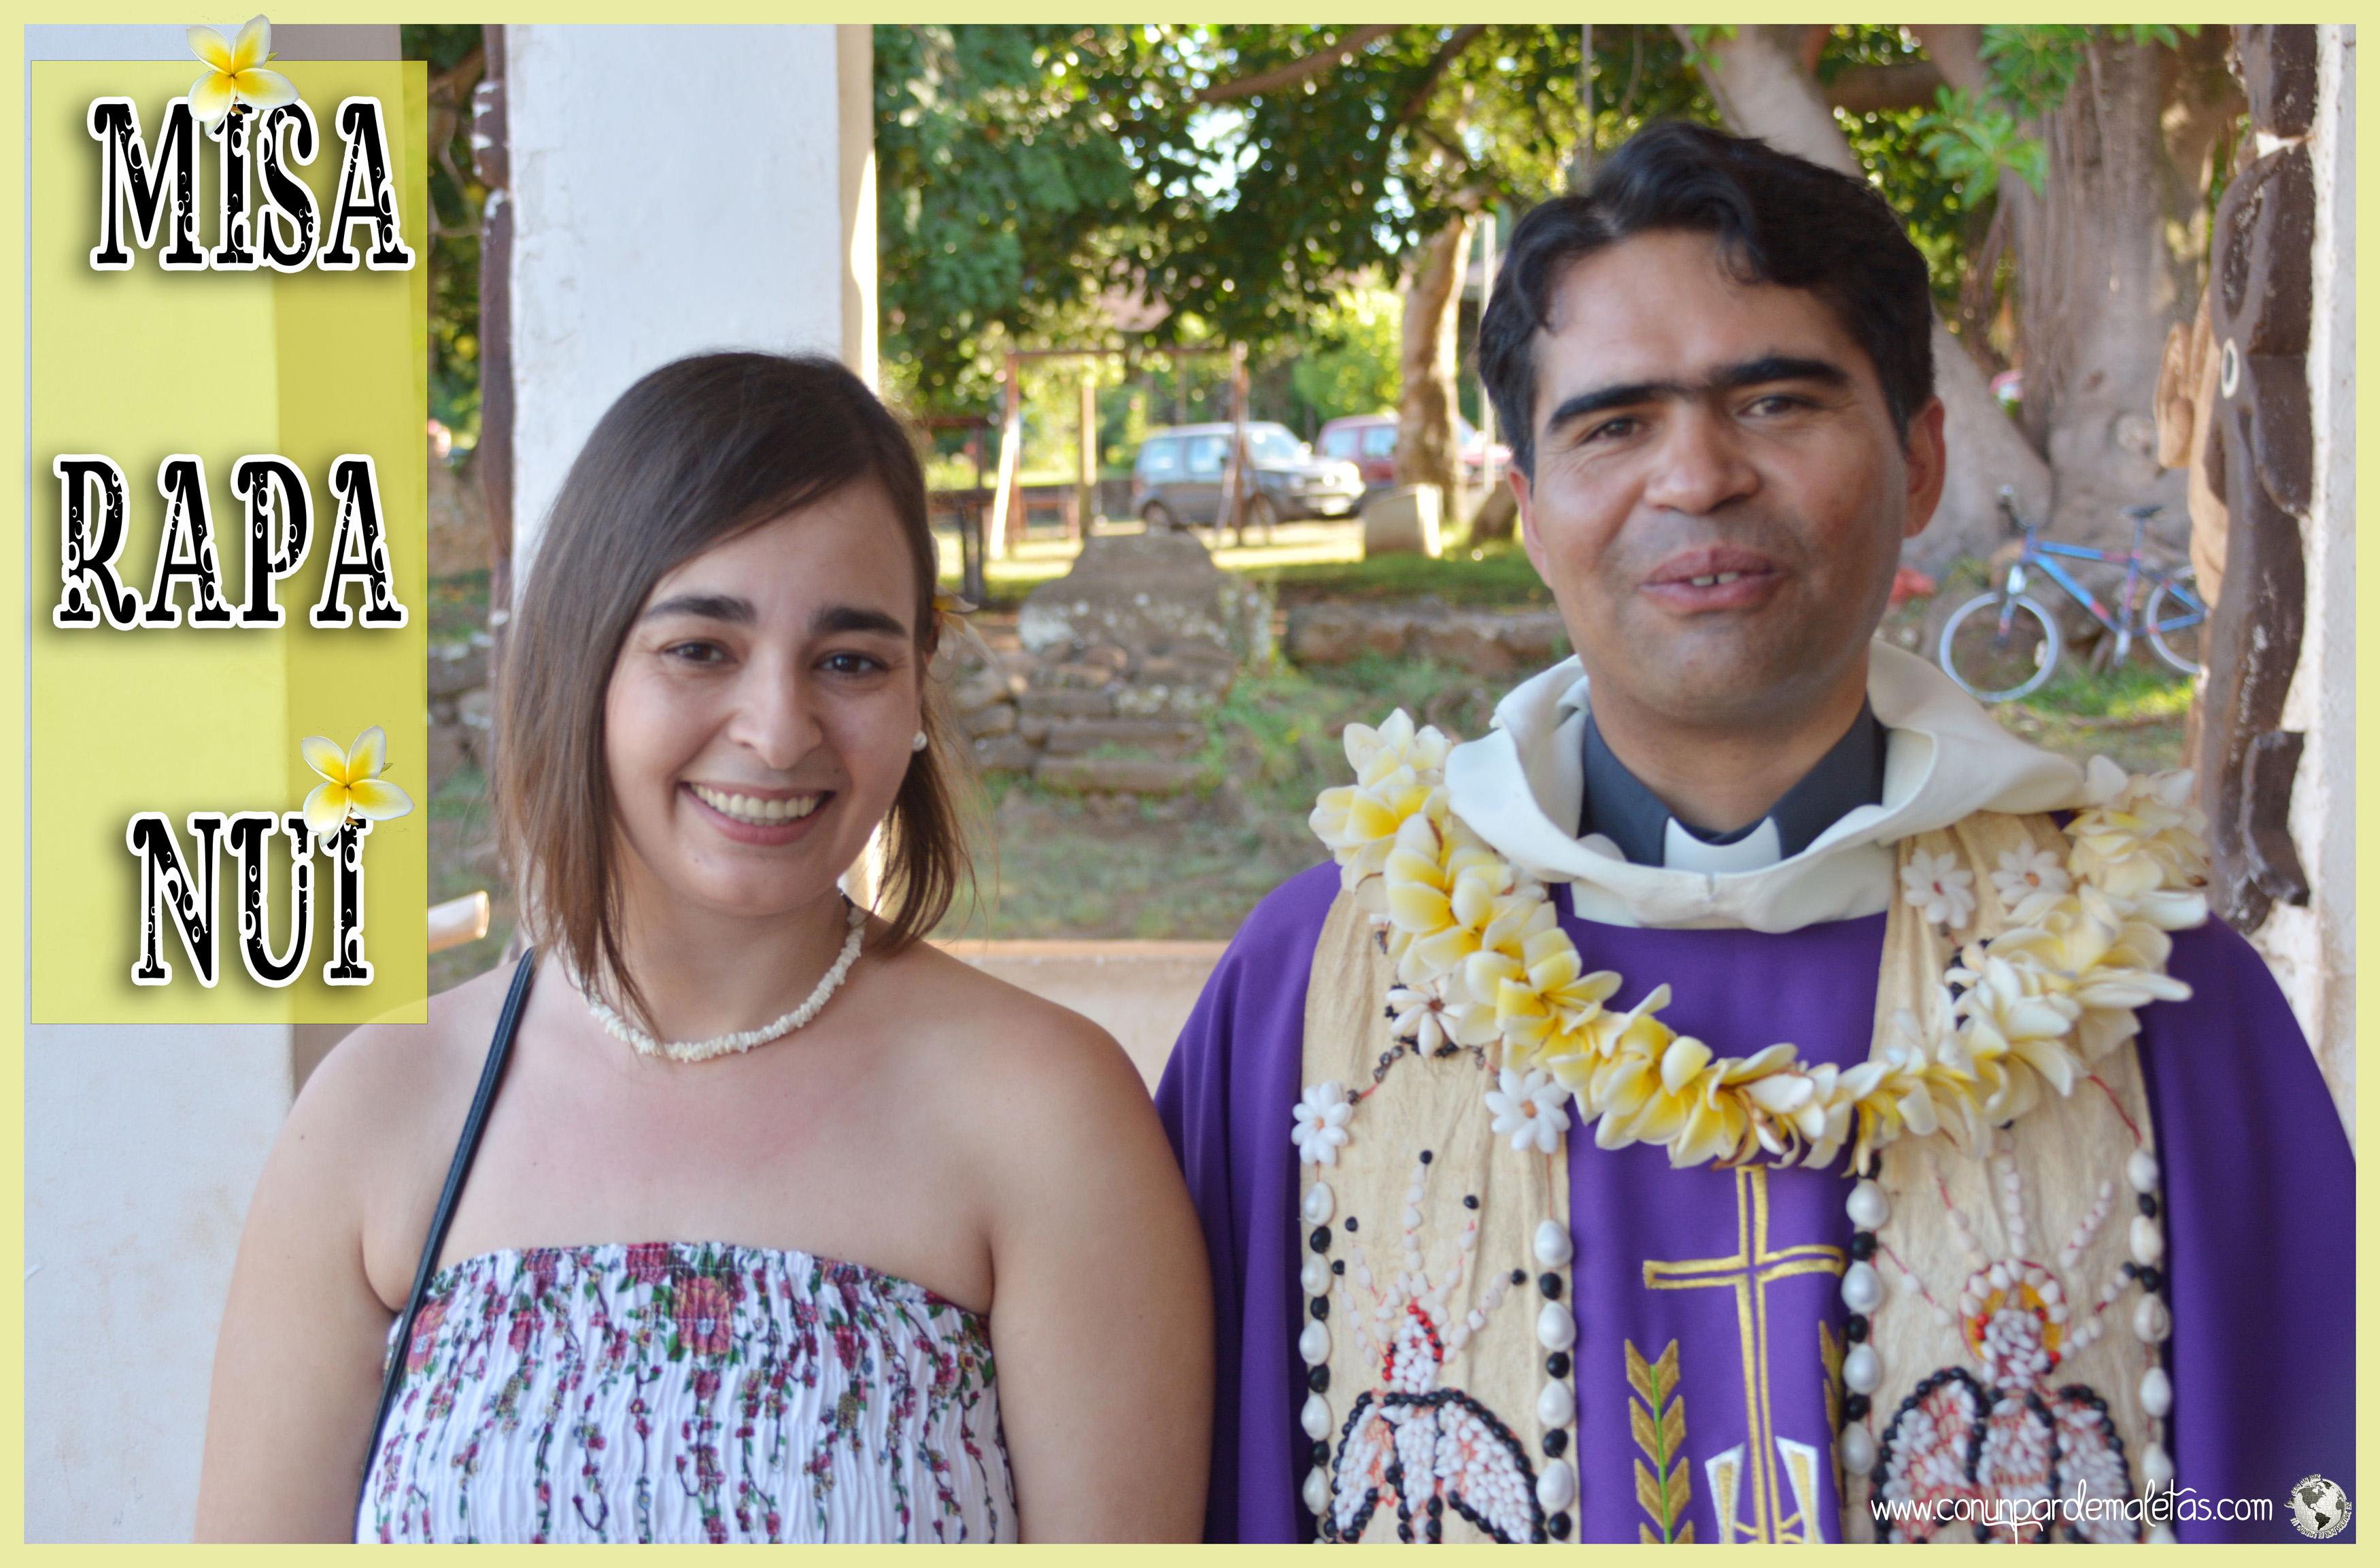 Misa Rapa Nui, Isla de Pascua